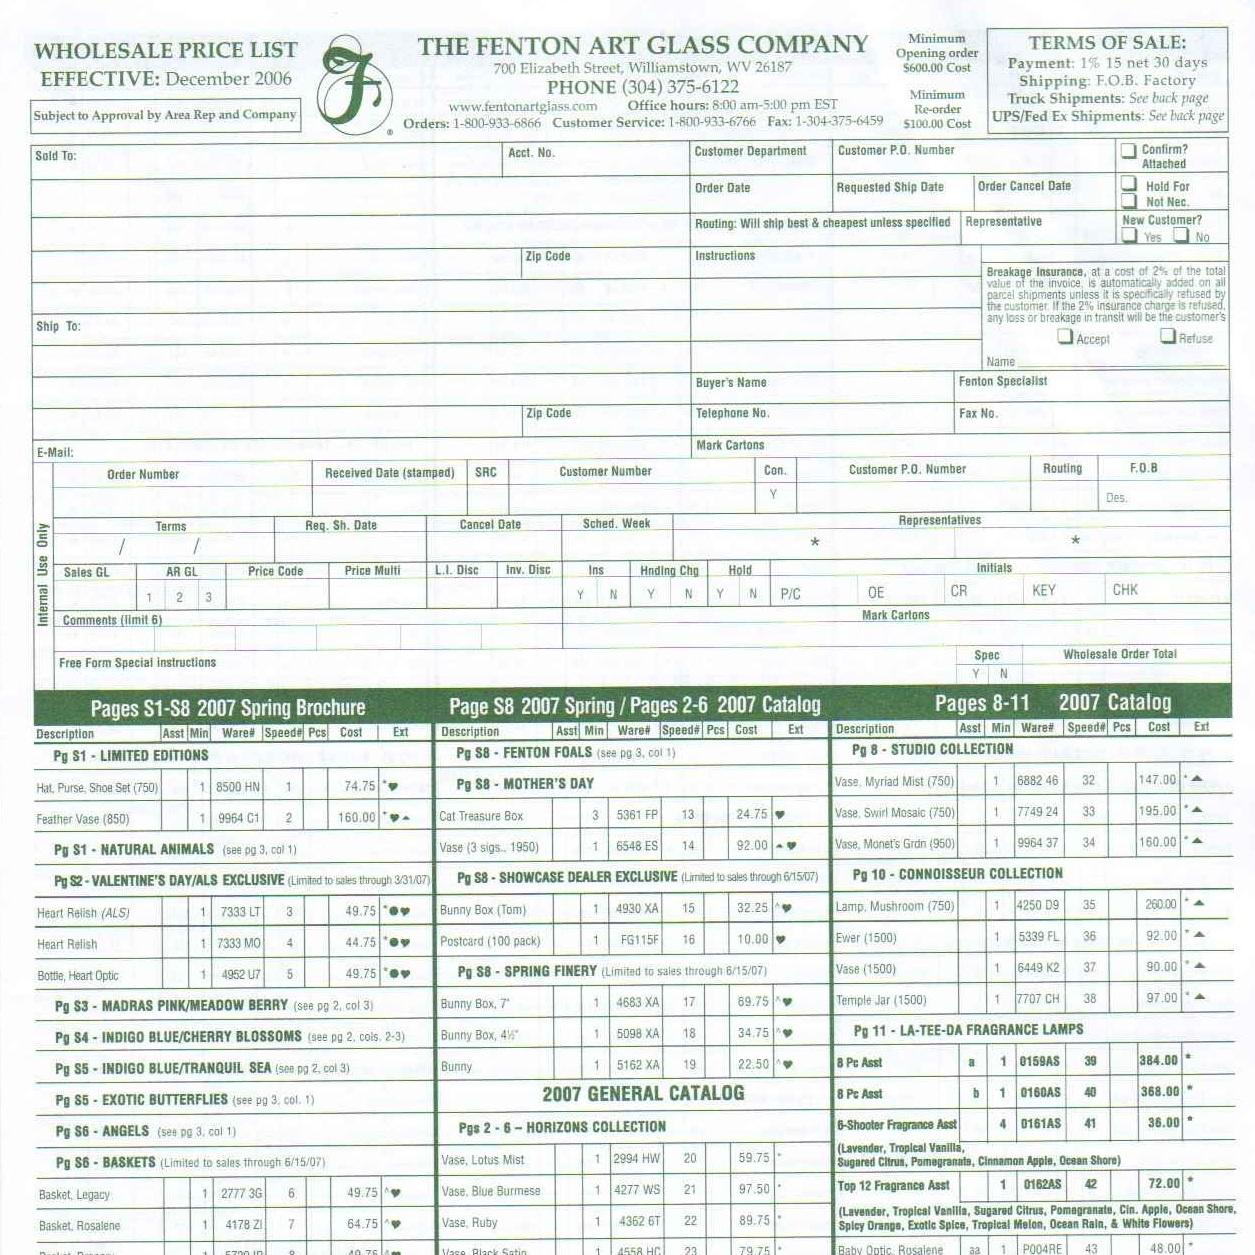 2007 Price Guide